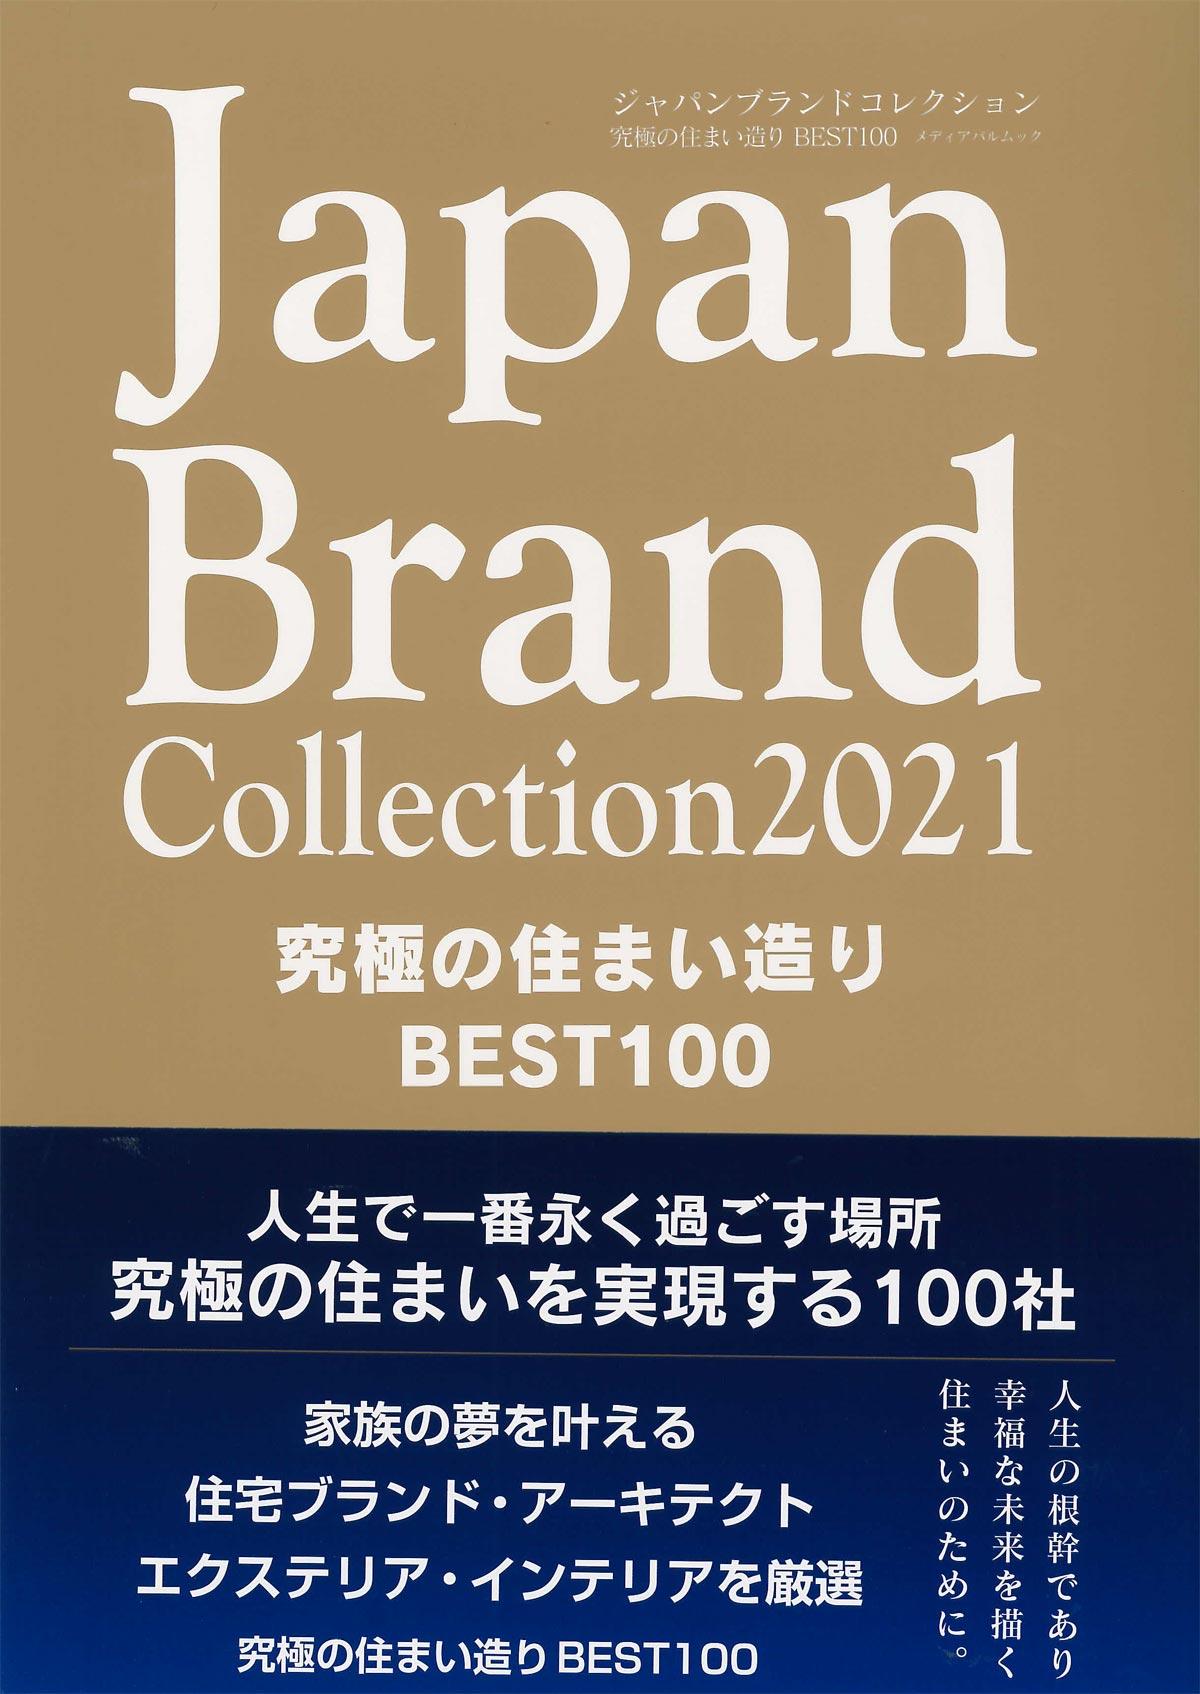 Japan Brand Collection 2021 究極の住まい造りBEST100